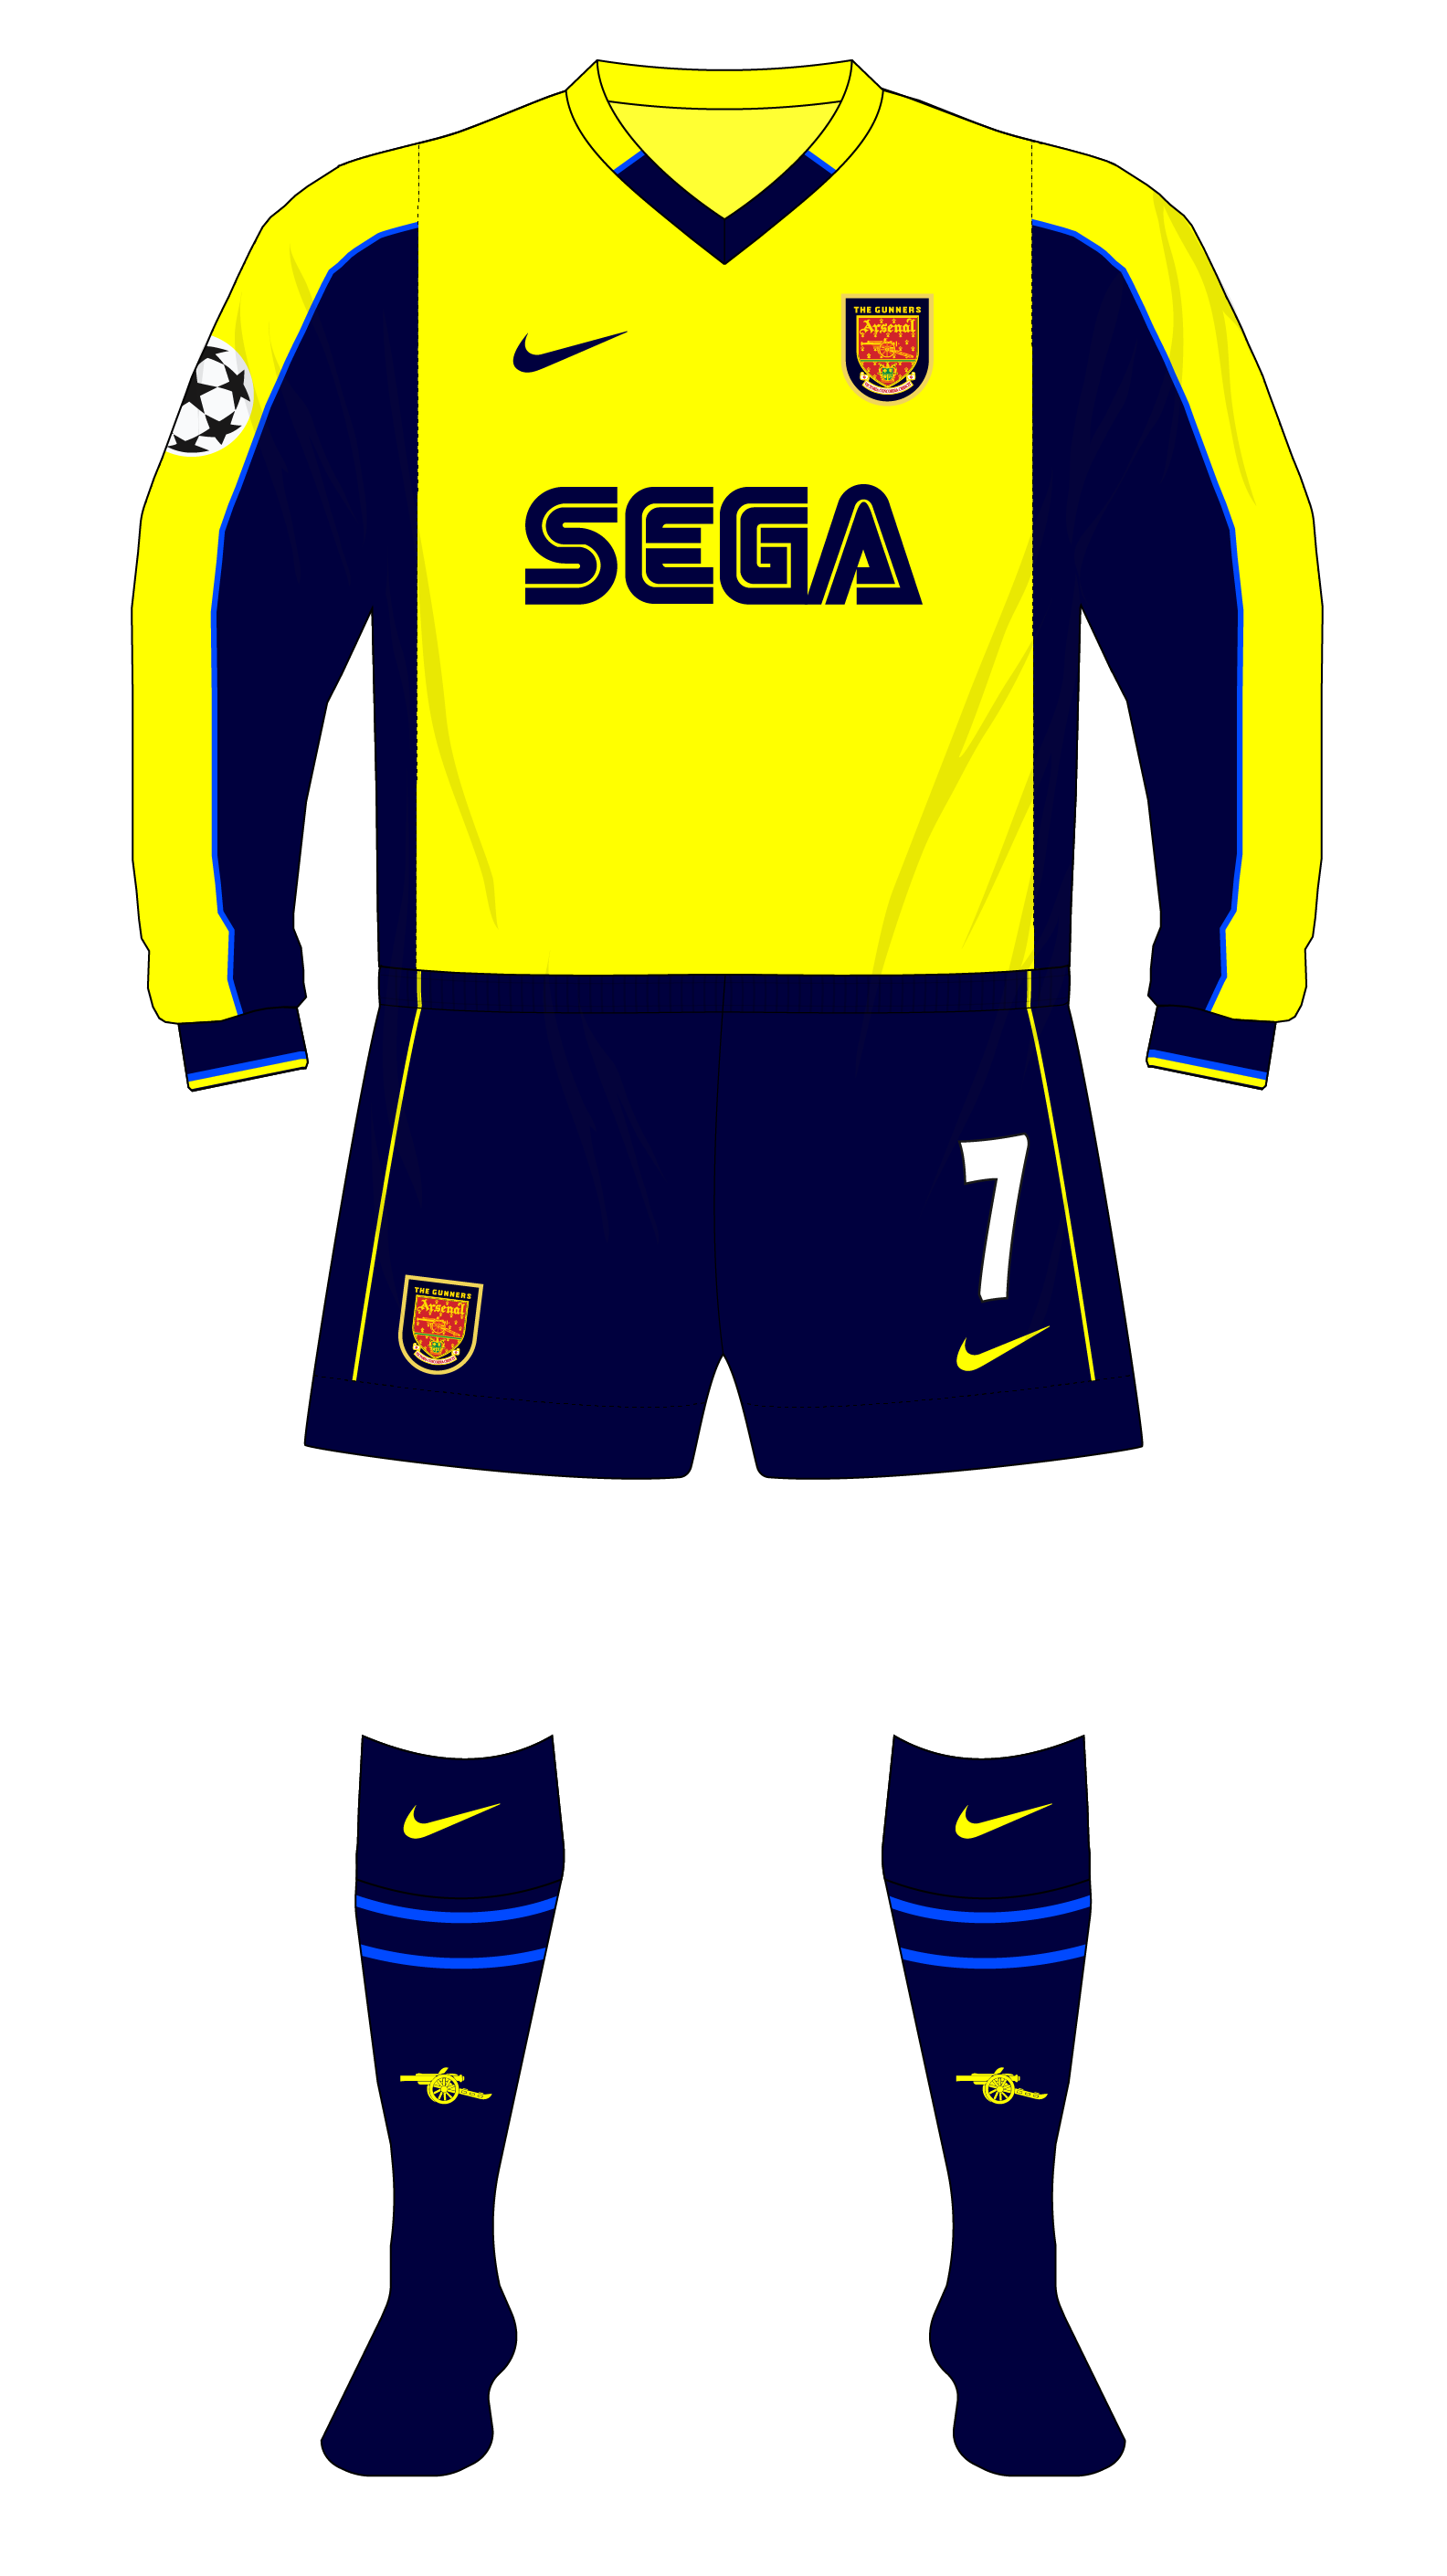 quality design 6a6f7 ca497 Arsenal-2000-2001-Nike-away-kit-Bayern-Champions-League-01 ...